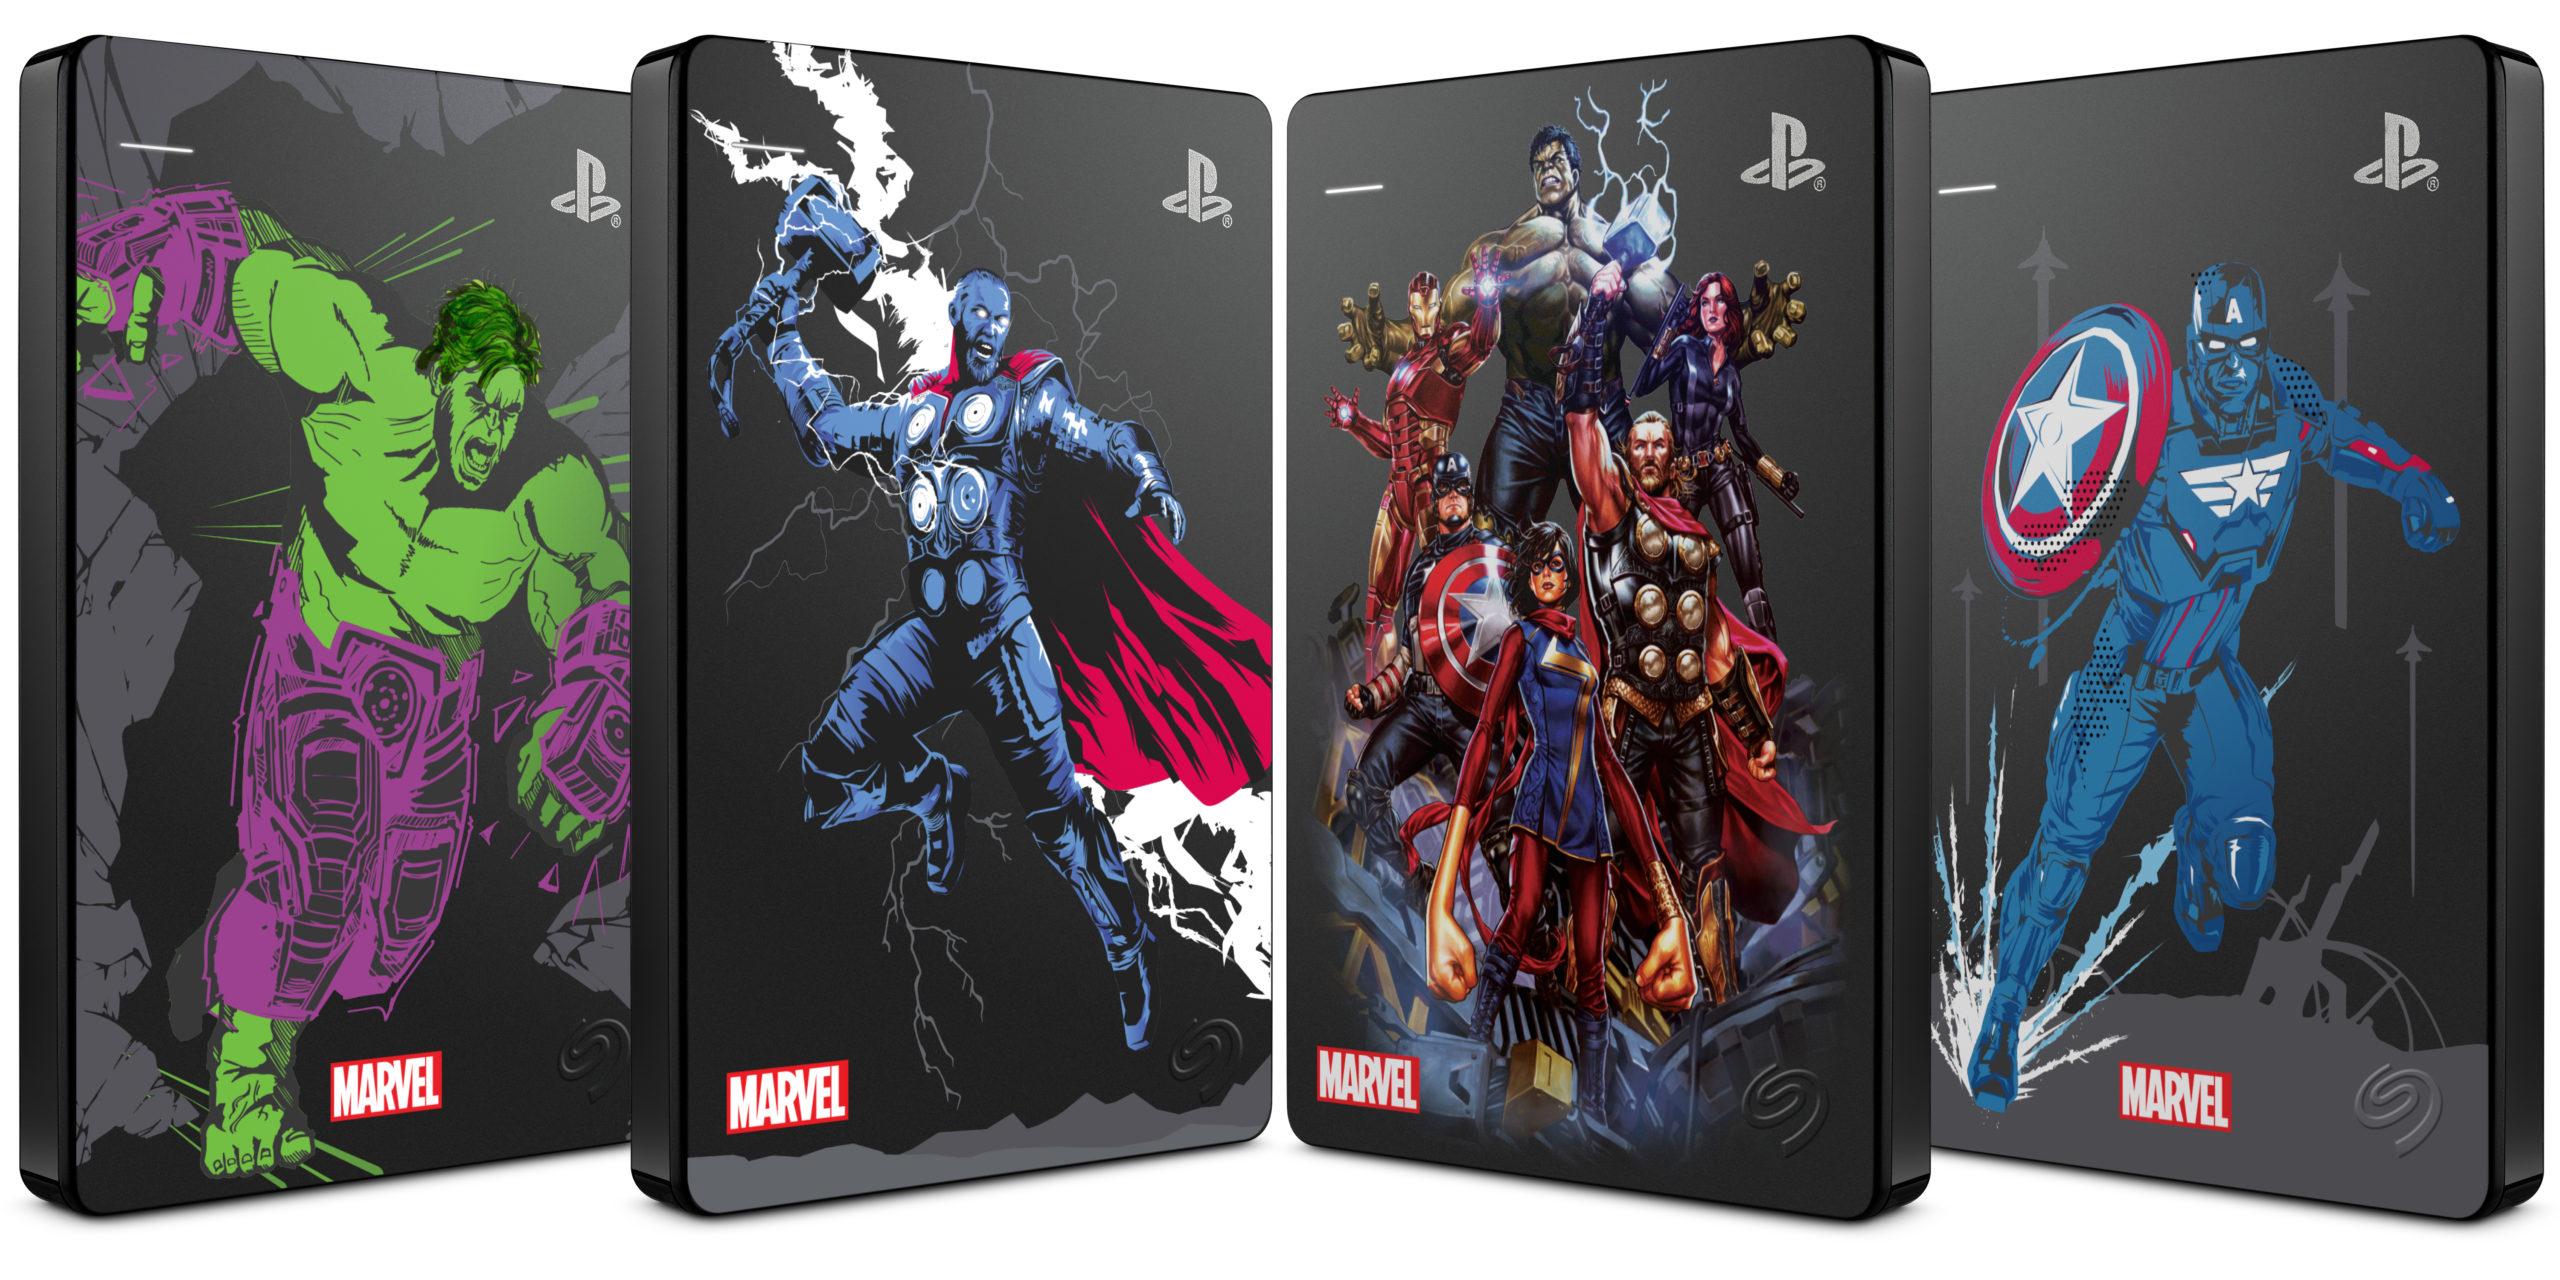 Seagate представила диск Marvel для PS4